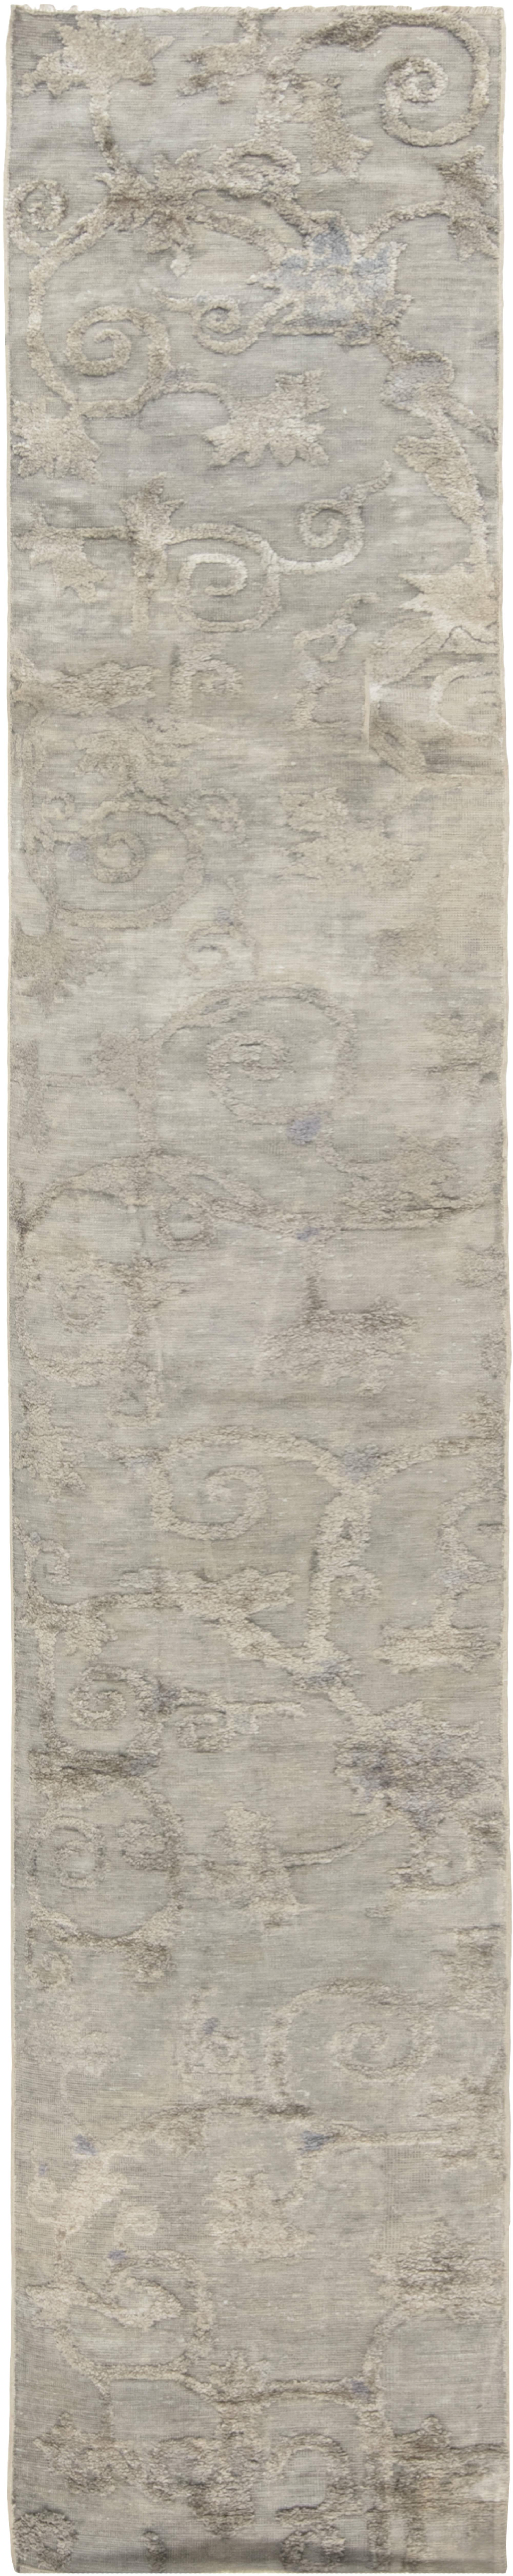 Antique Silk Chinese Runner (fragment) BB6505